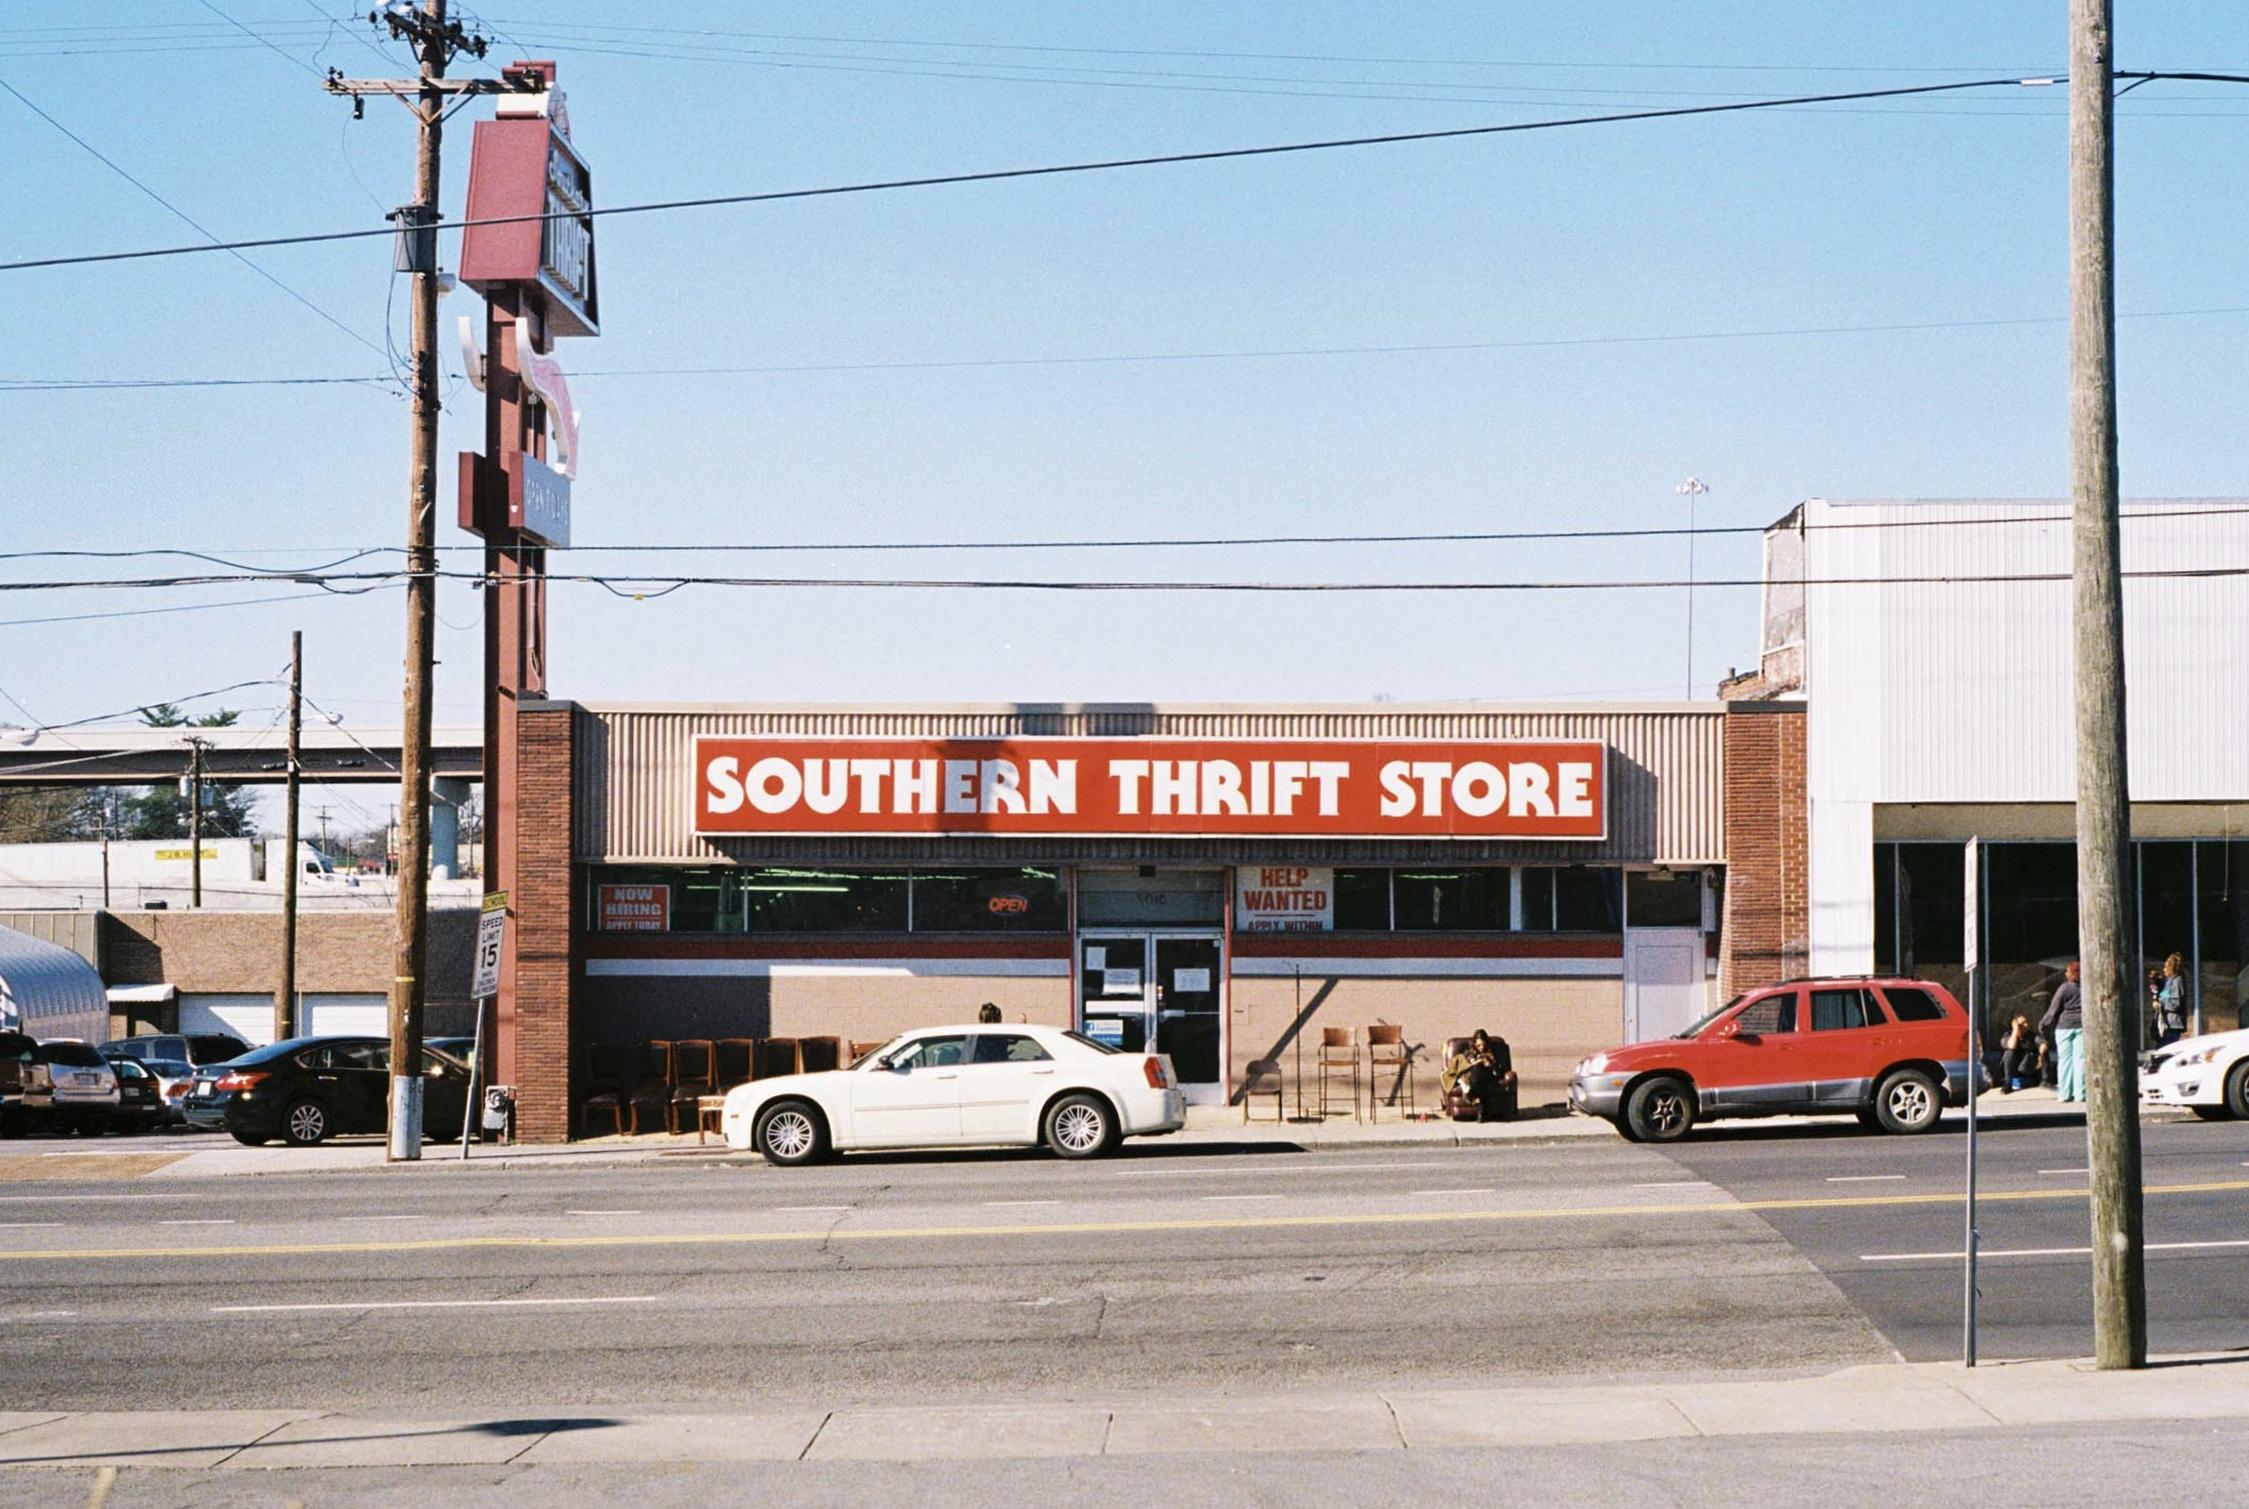 Southern Thrift Store.  Nashville, Tennessee.  Kodak Ultra Max 400. Pentax K1000. Fletcher Berryman 2019.